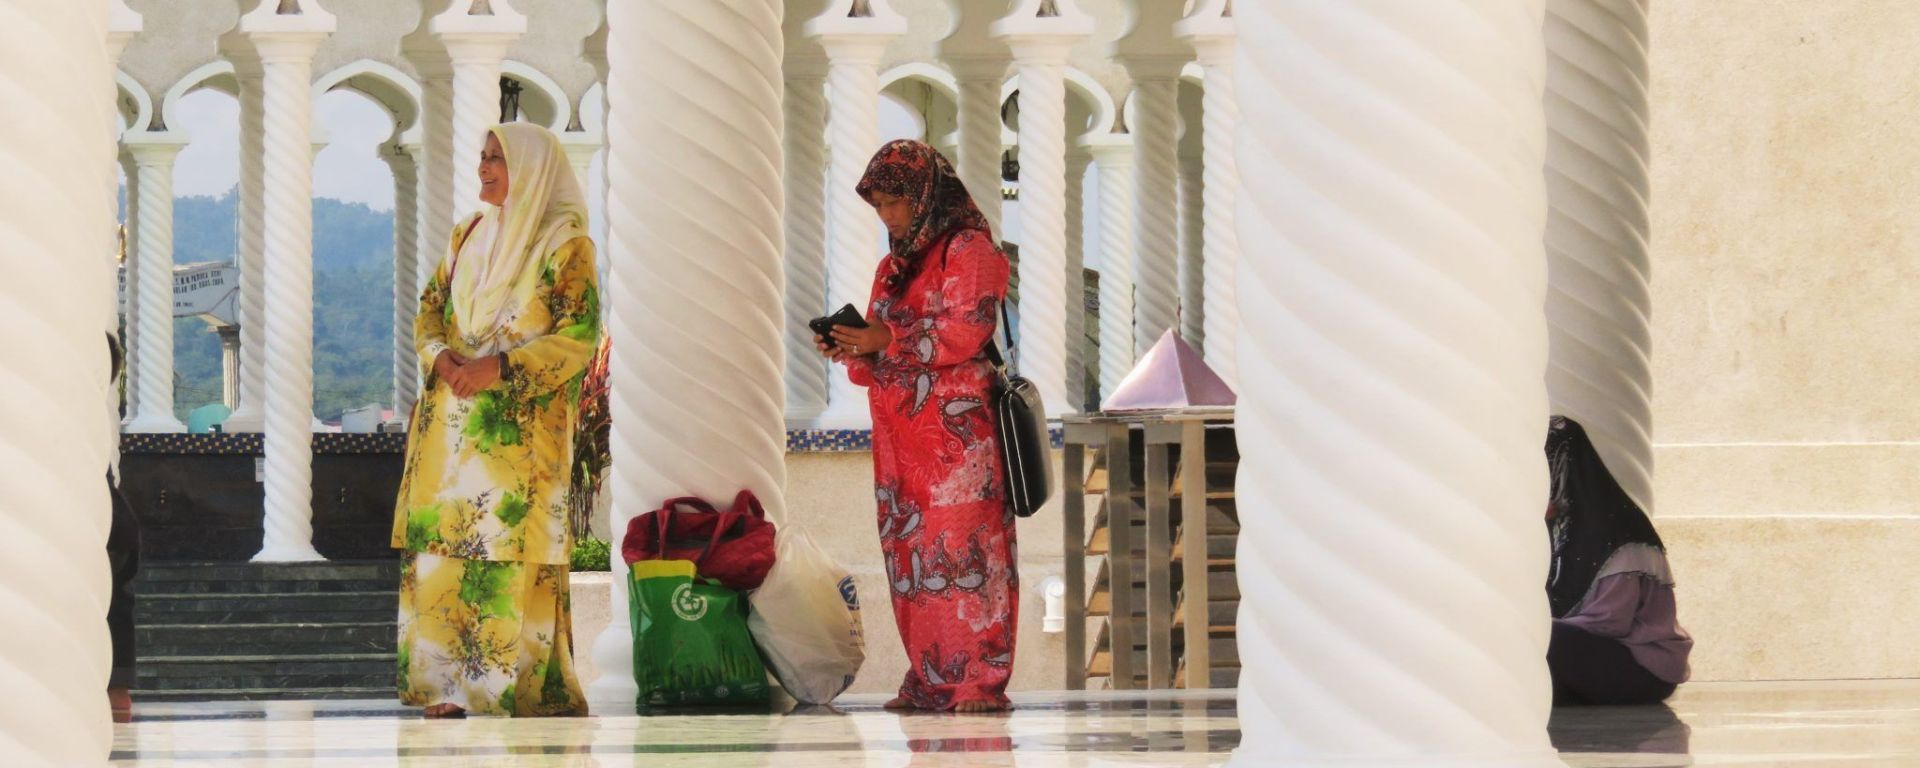 Bandar Seri Begawan, Mezquita del Sultán Omar Ali Saifuddin, Brunei